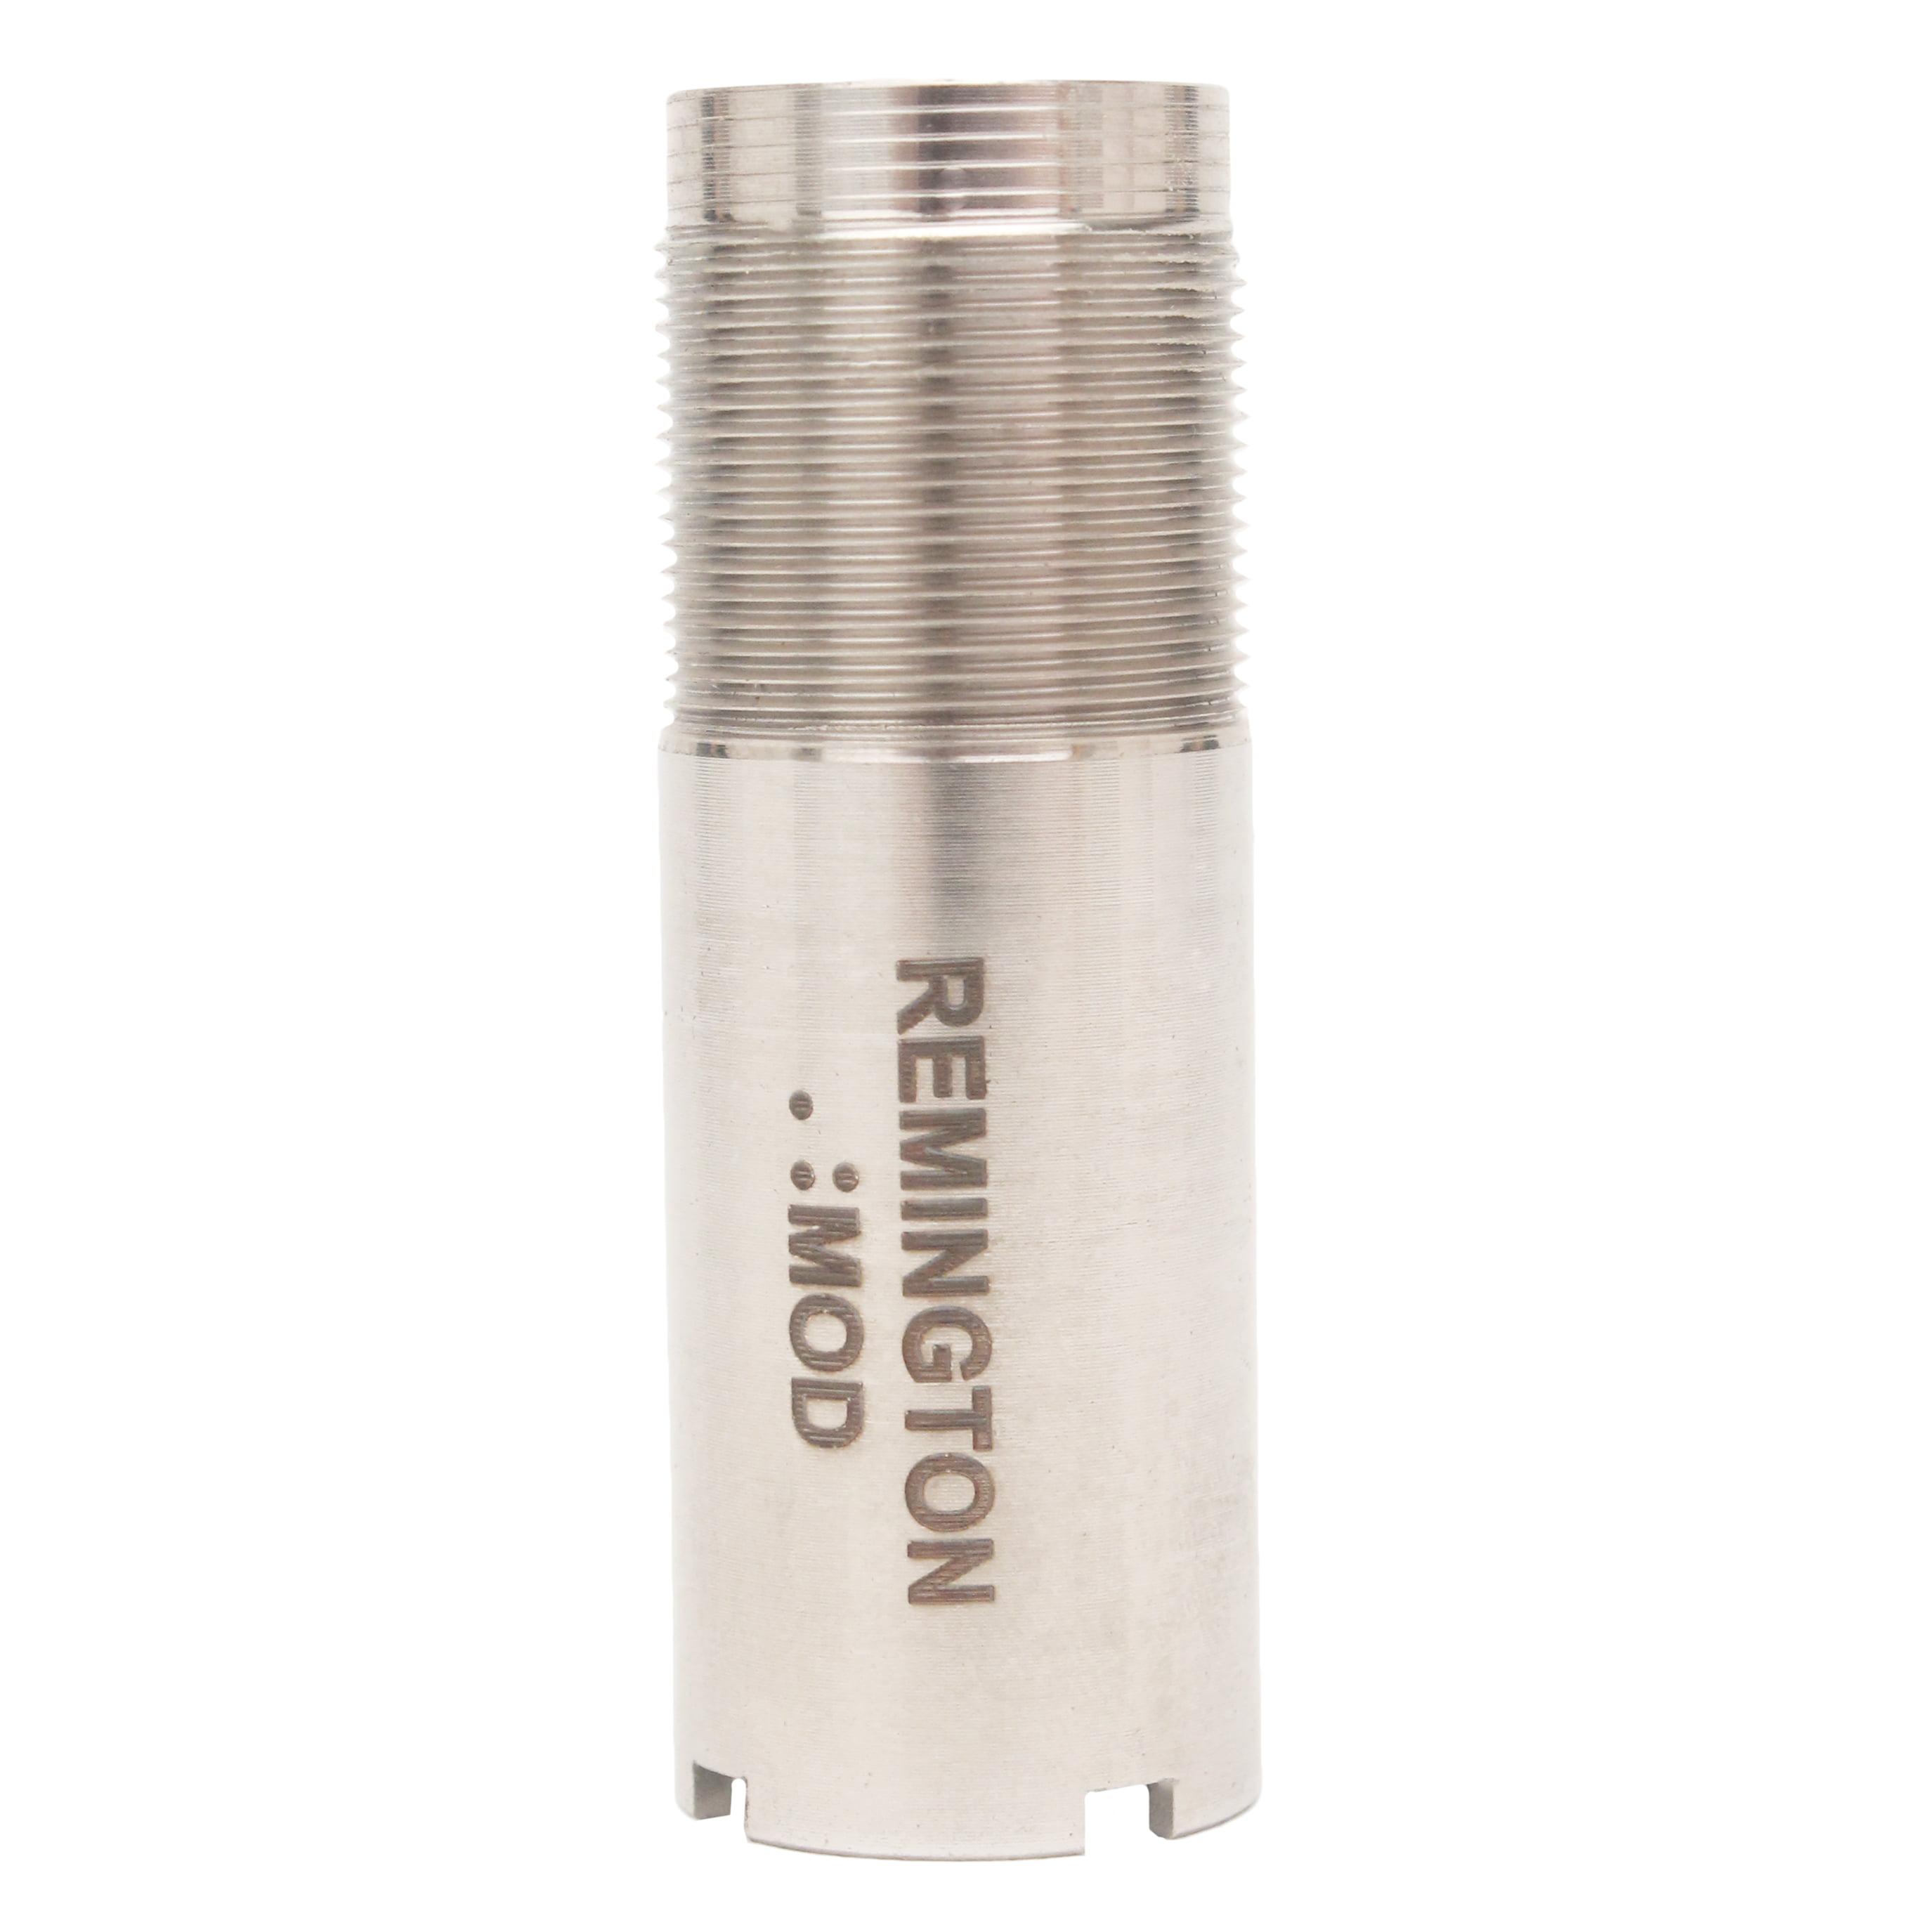 Remington Accessories Remington Choke Tube 20 Gauge Modified